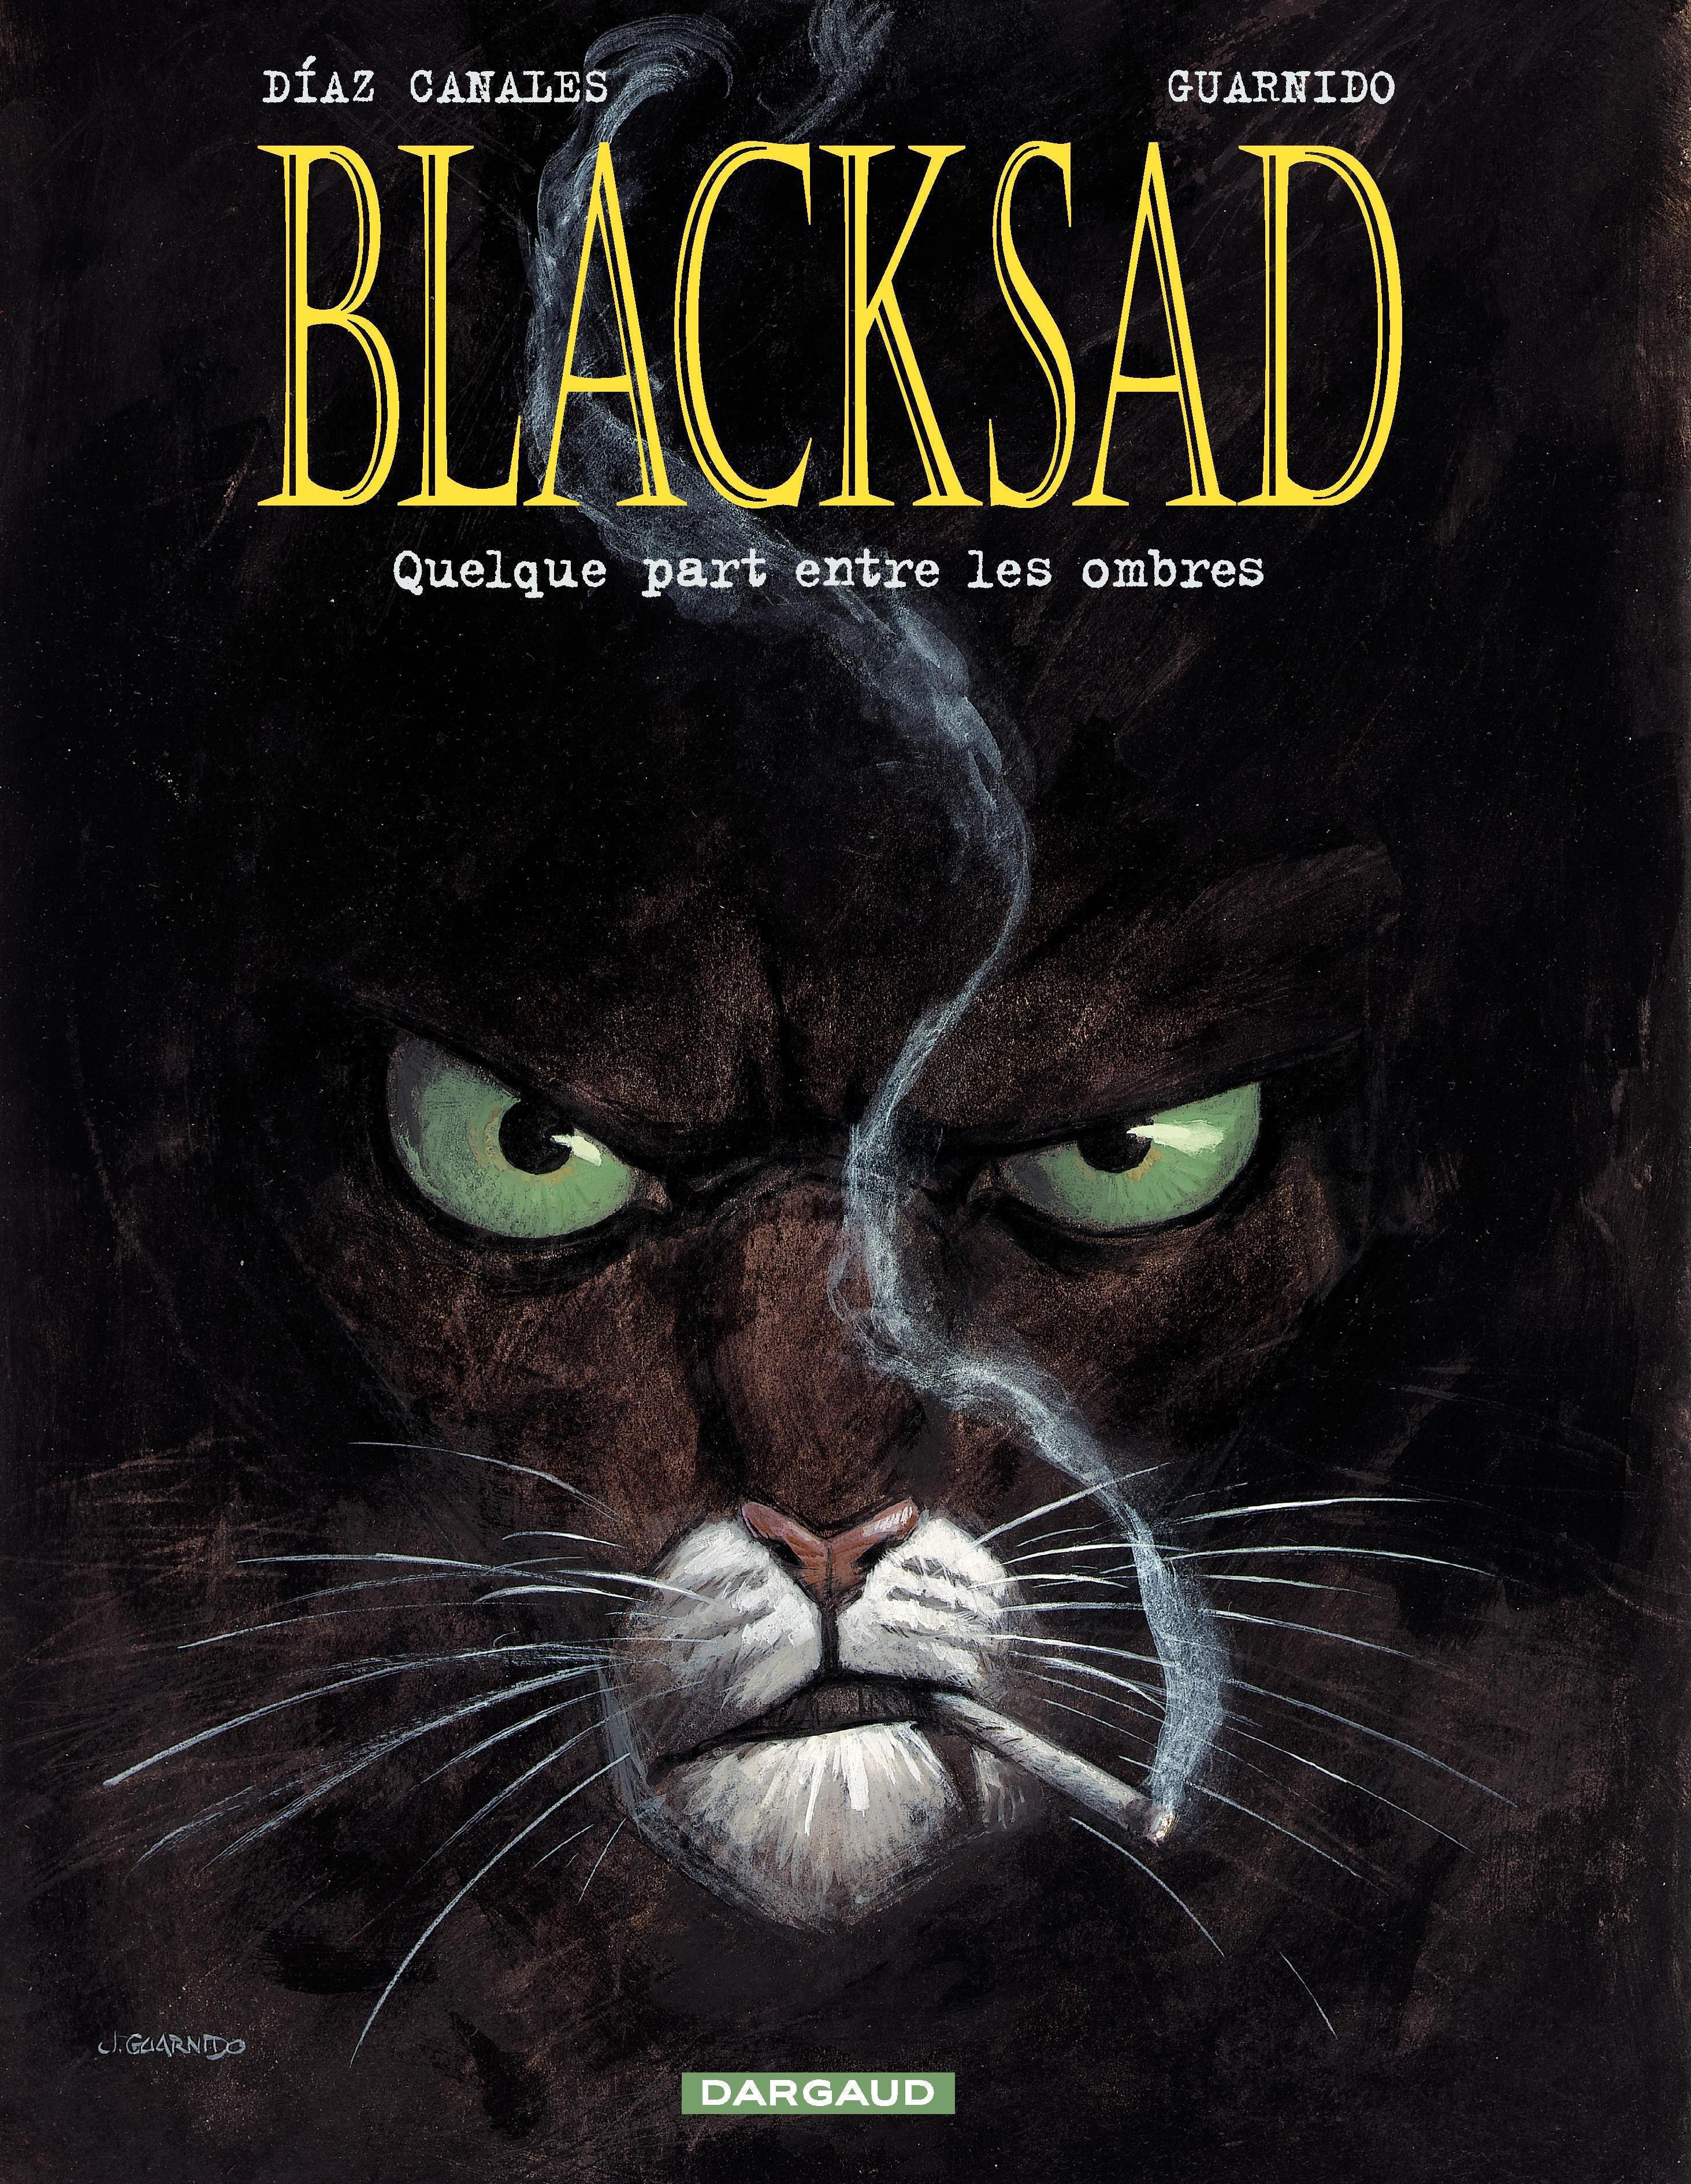 Blacksad - tome 1 - Quelque part entre les ombres | Guarnido,